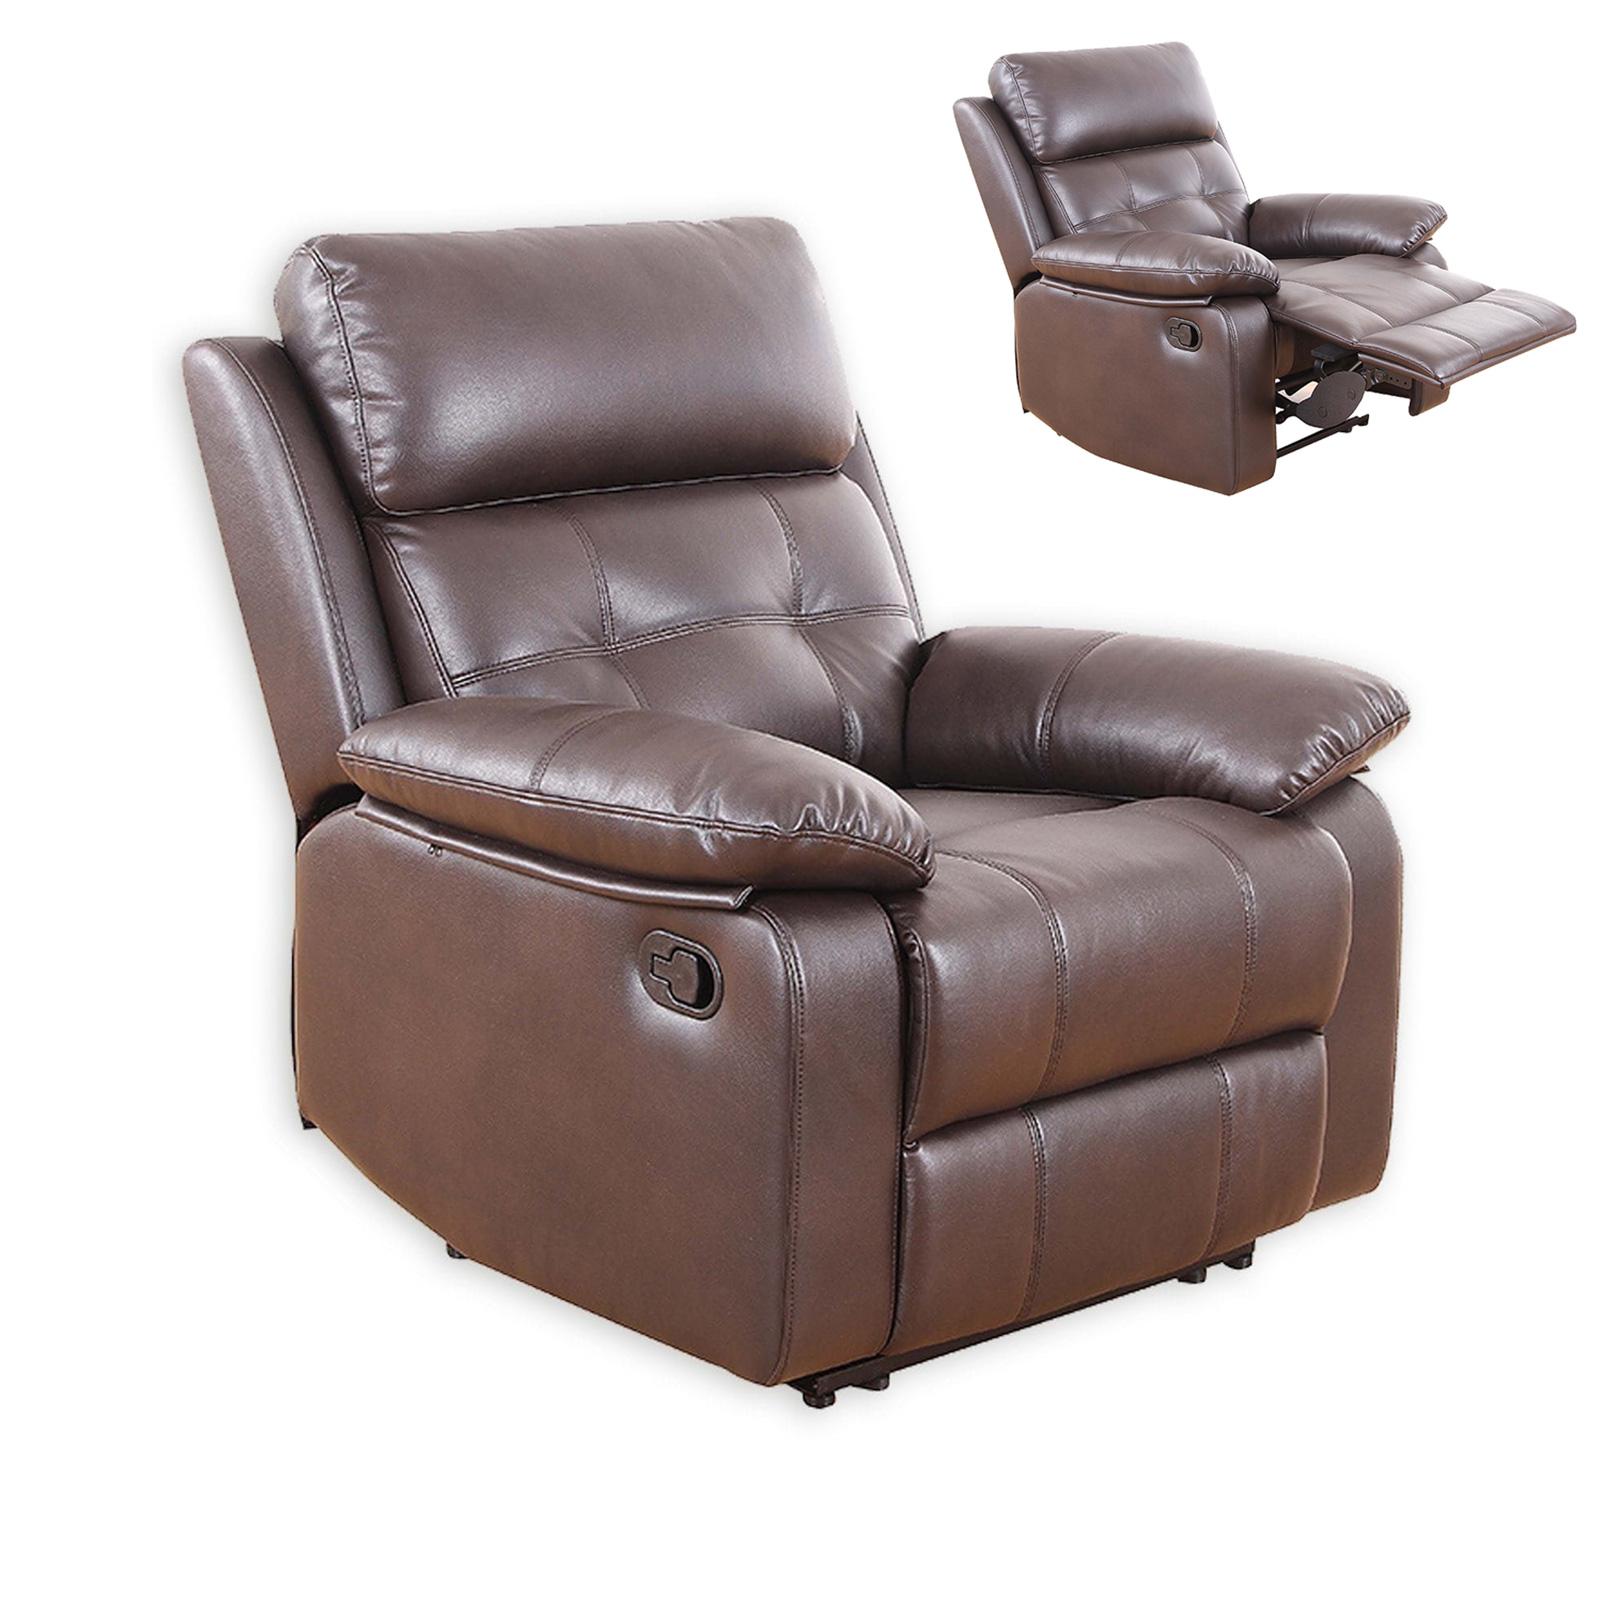 Set 2 Sofas und 1 Sessel dunkelbraun Kunstleder